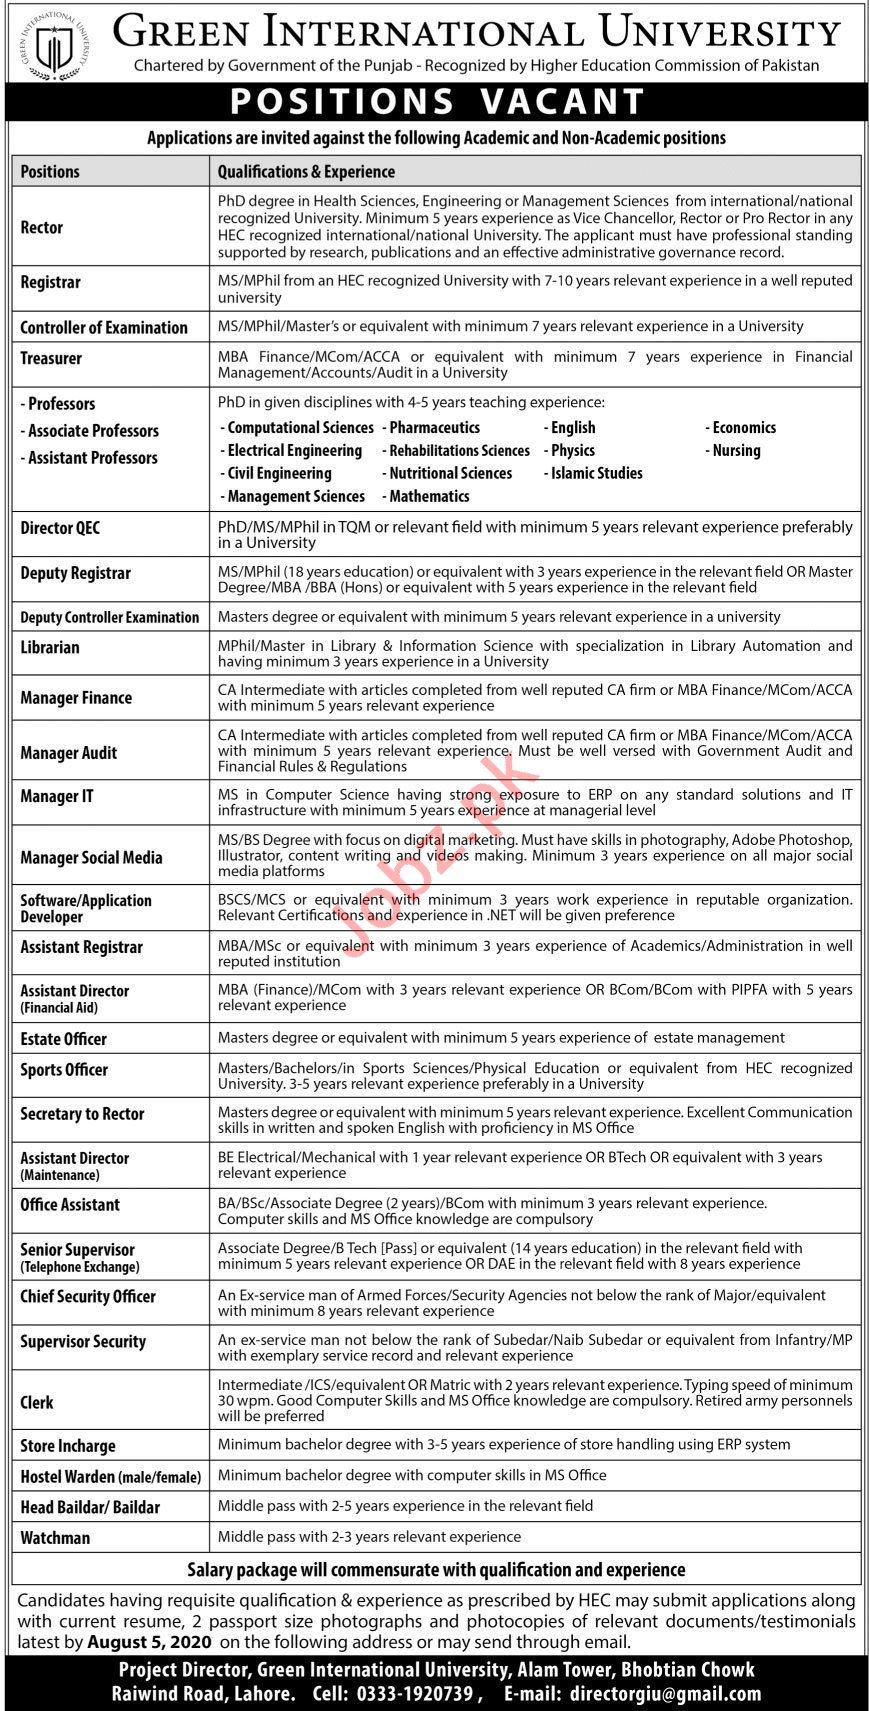 Green International University Lahore Jobs 2020 for Rector